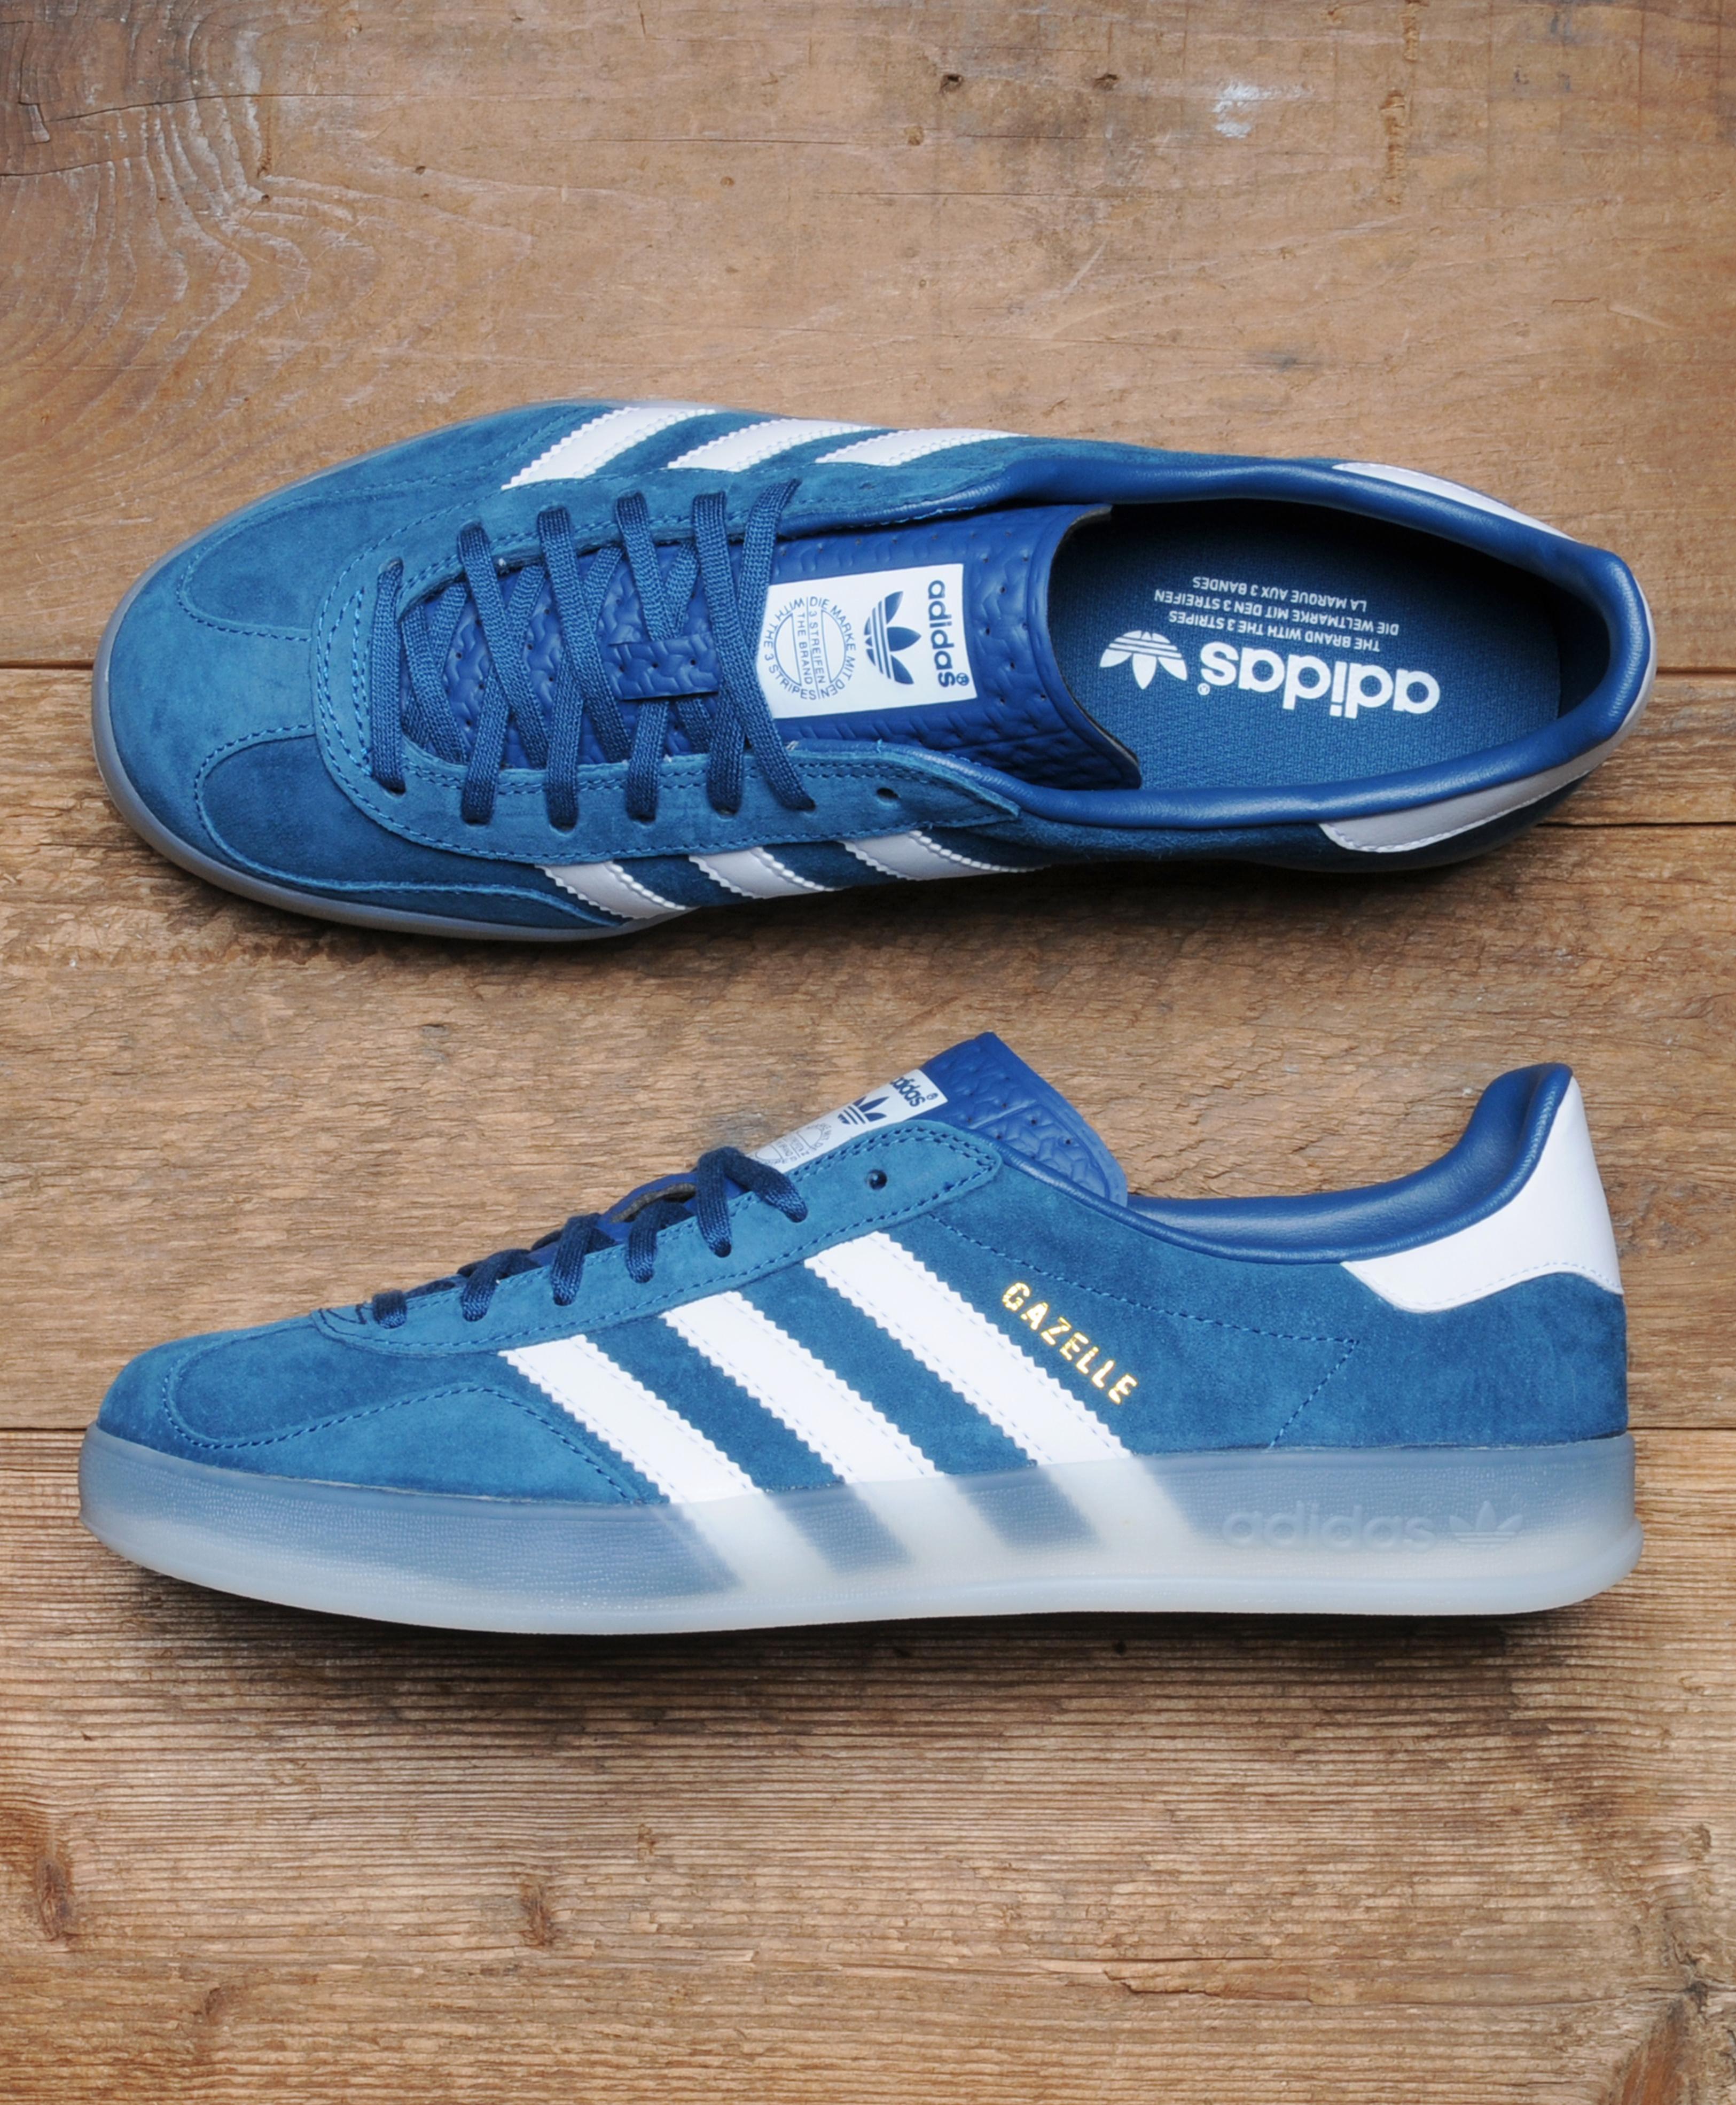 Adidas Originals Gazelle Indoor Green